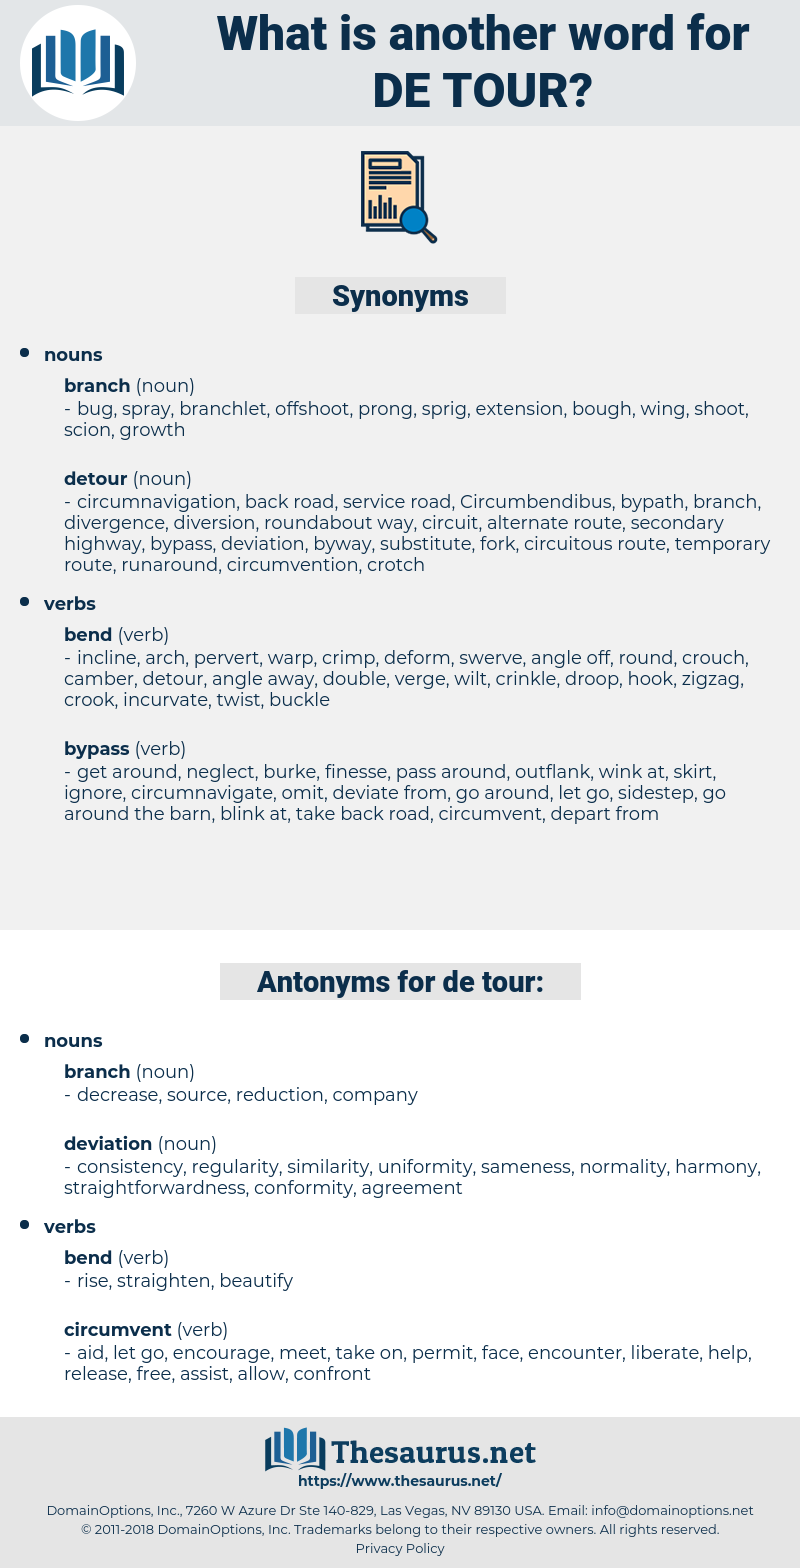 de tour, synonym de tour, another word for de tour, words like de tour, thesaurus de tour